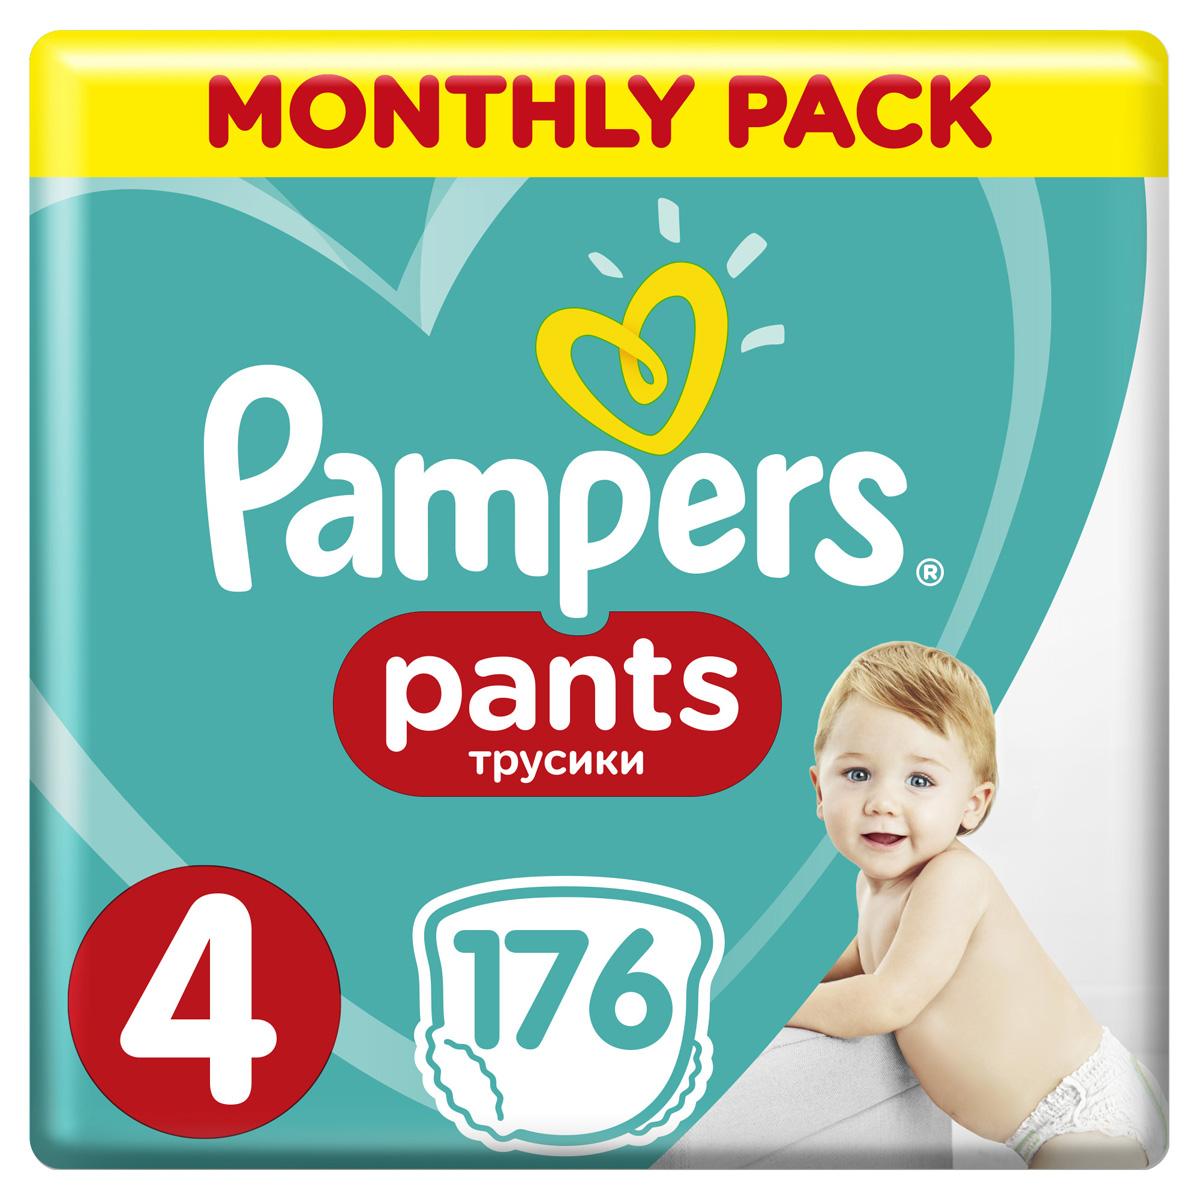 Pampers Трусики Pants 9-15 кг (размер 4) 176 шт Уцененный товар (№383)